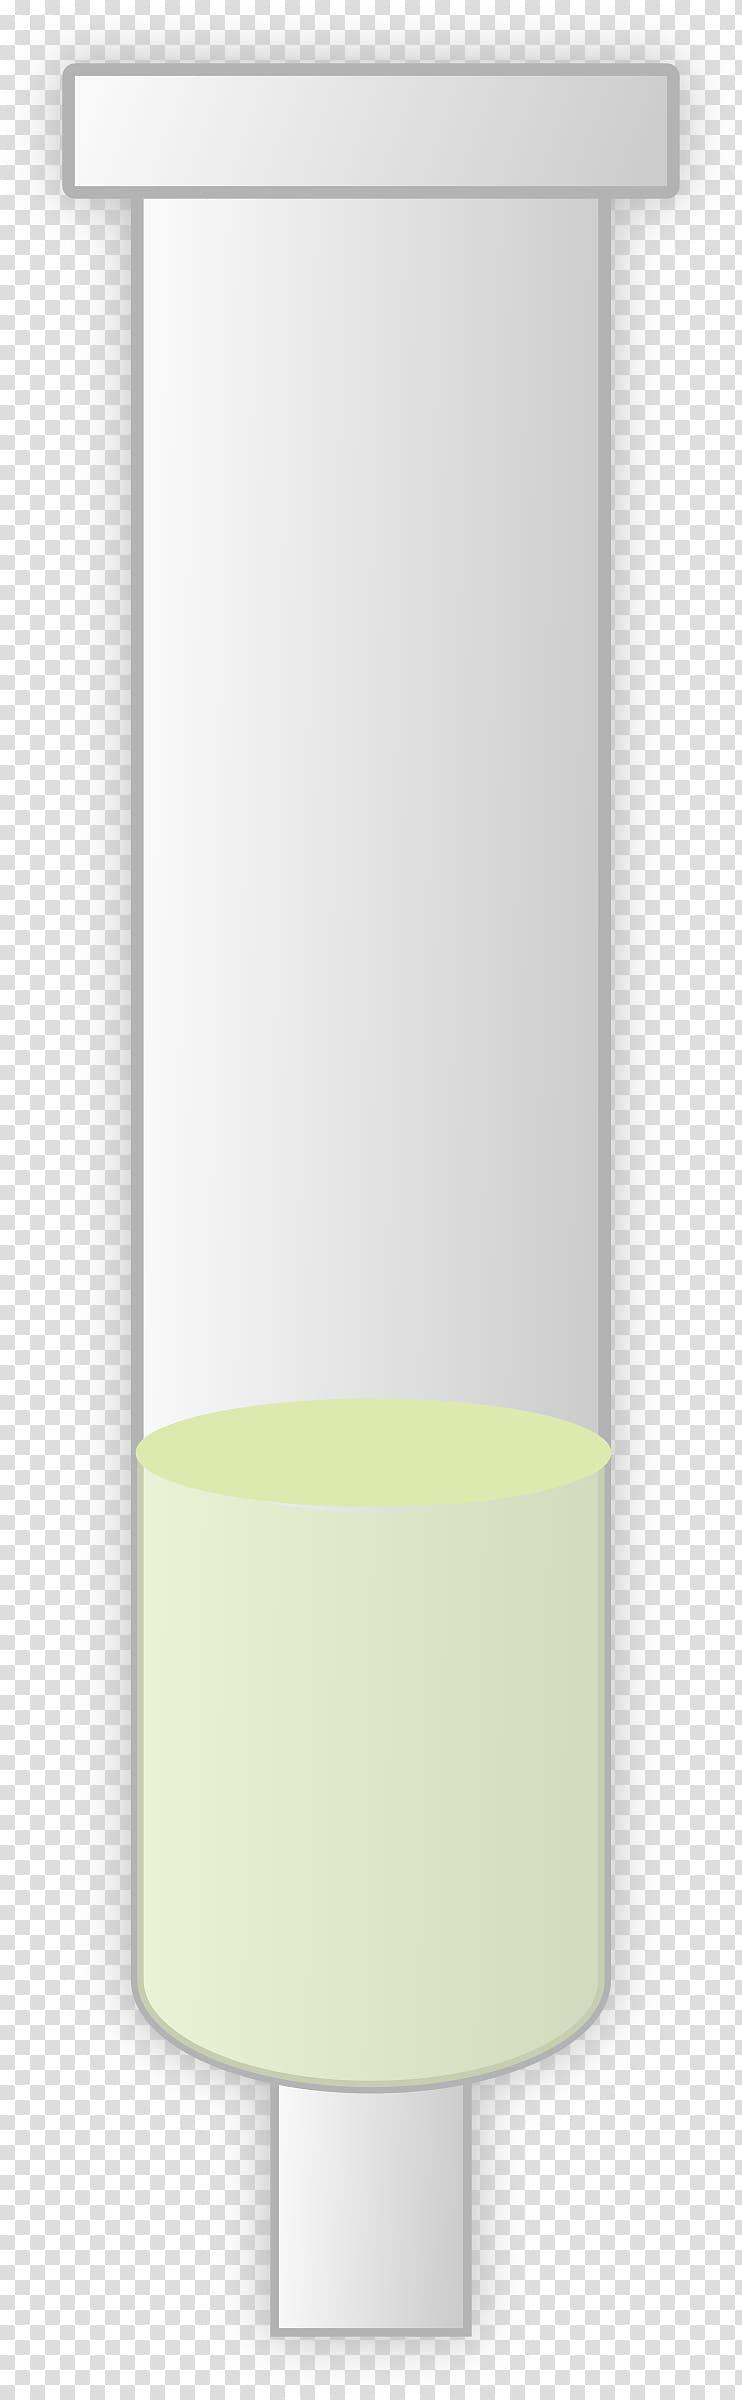 Chromatography Column transparent background PNG cliparts.